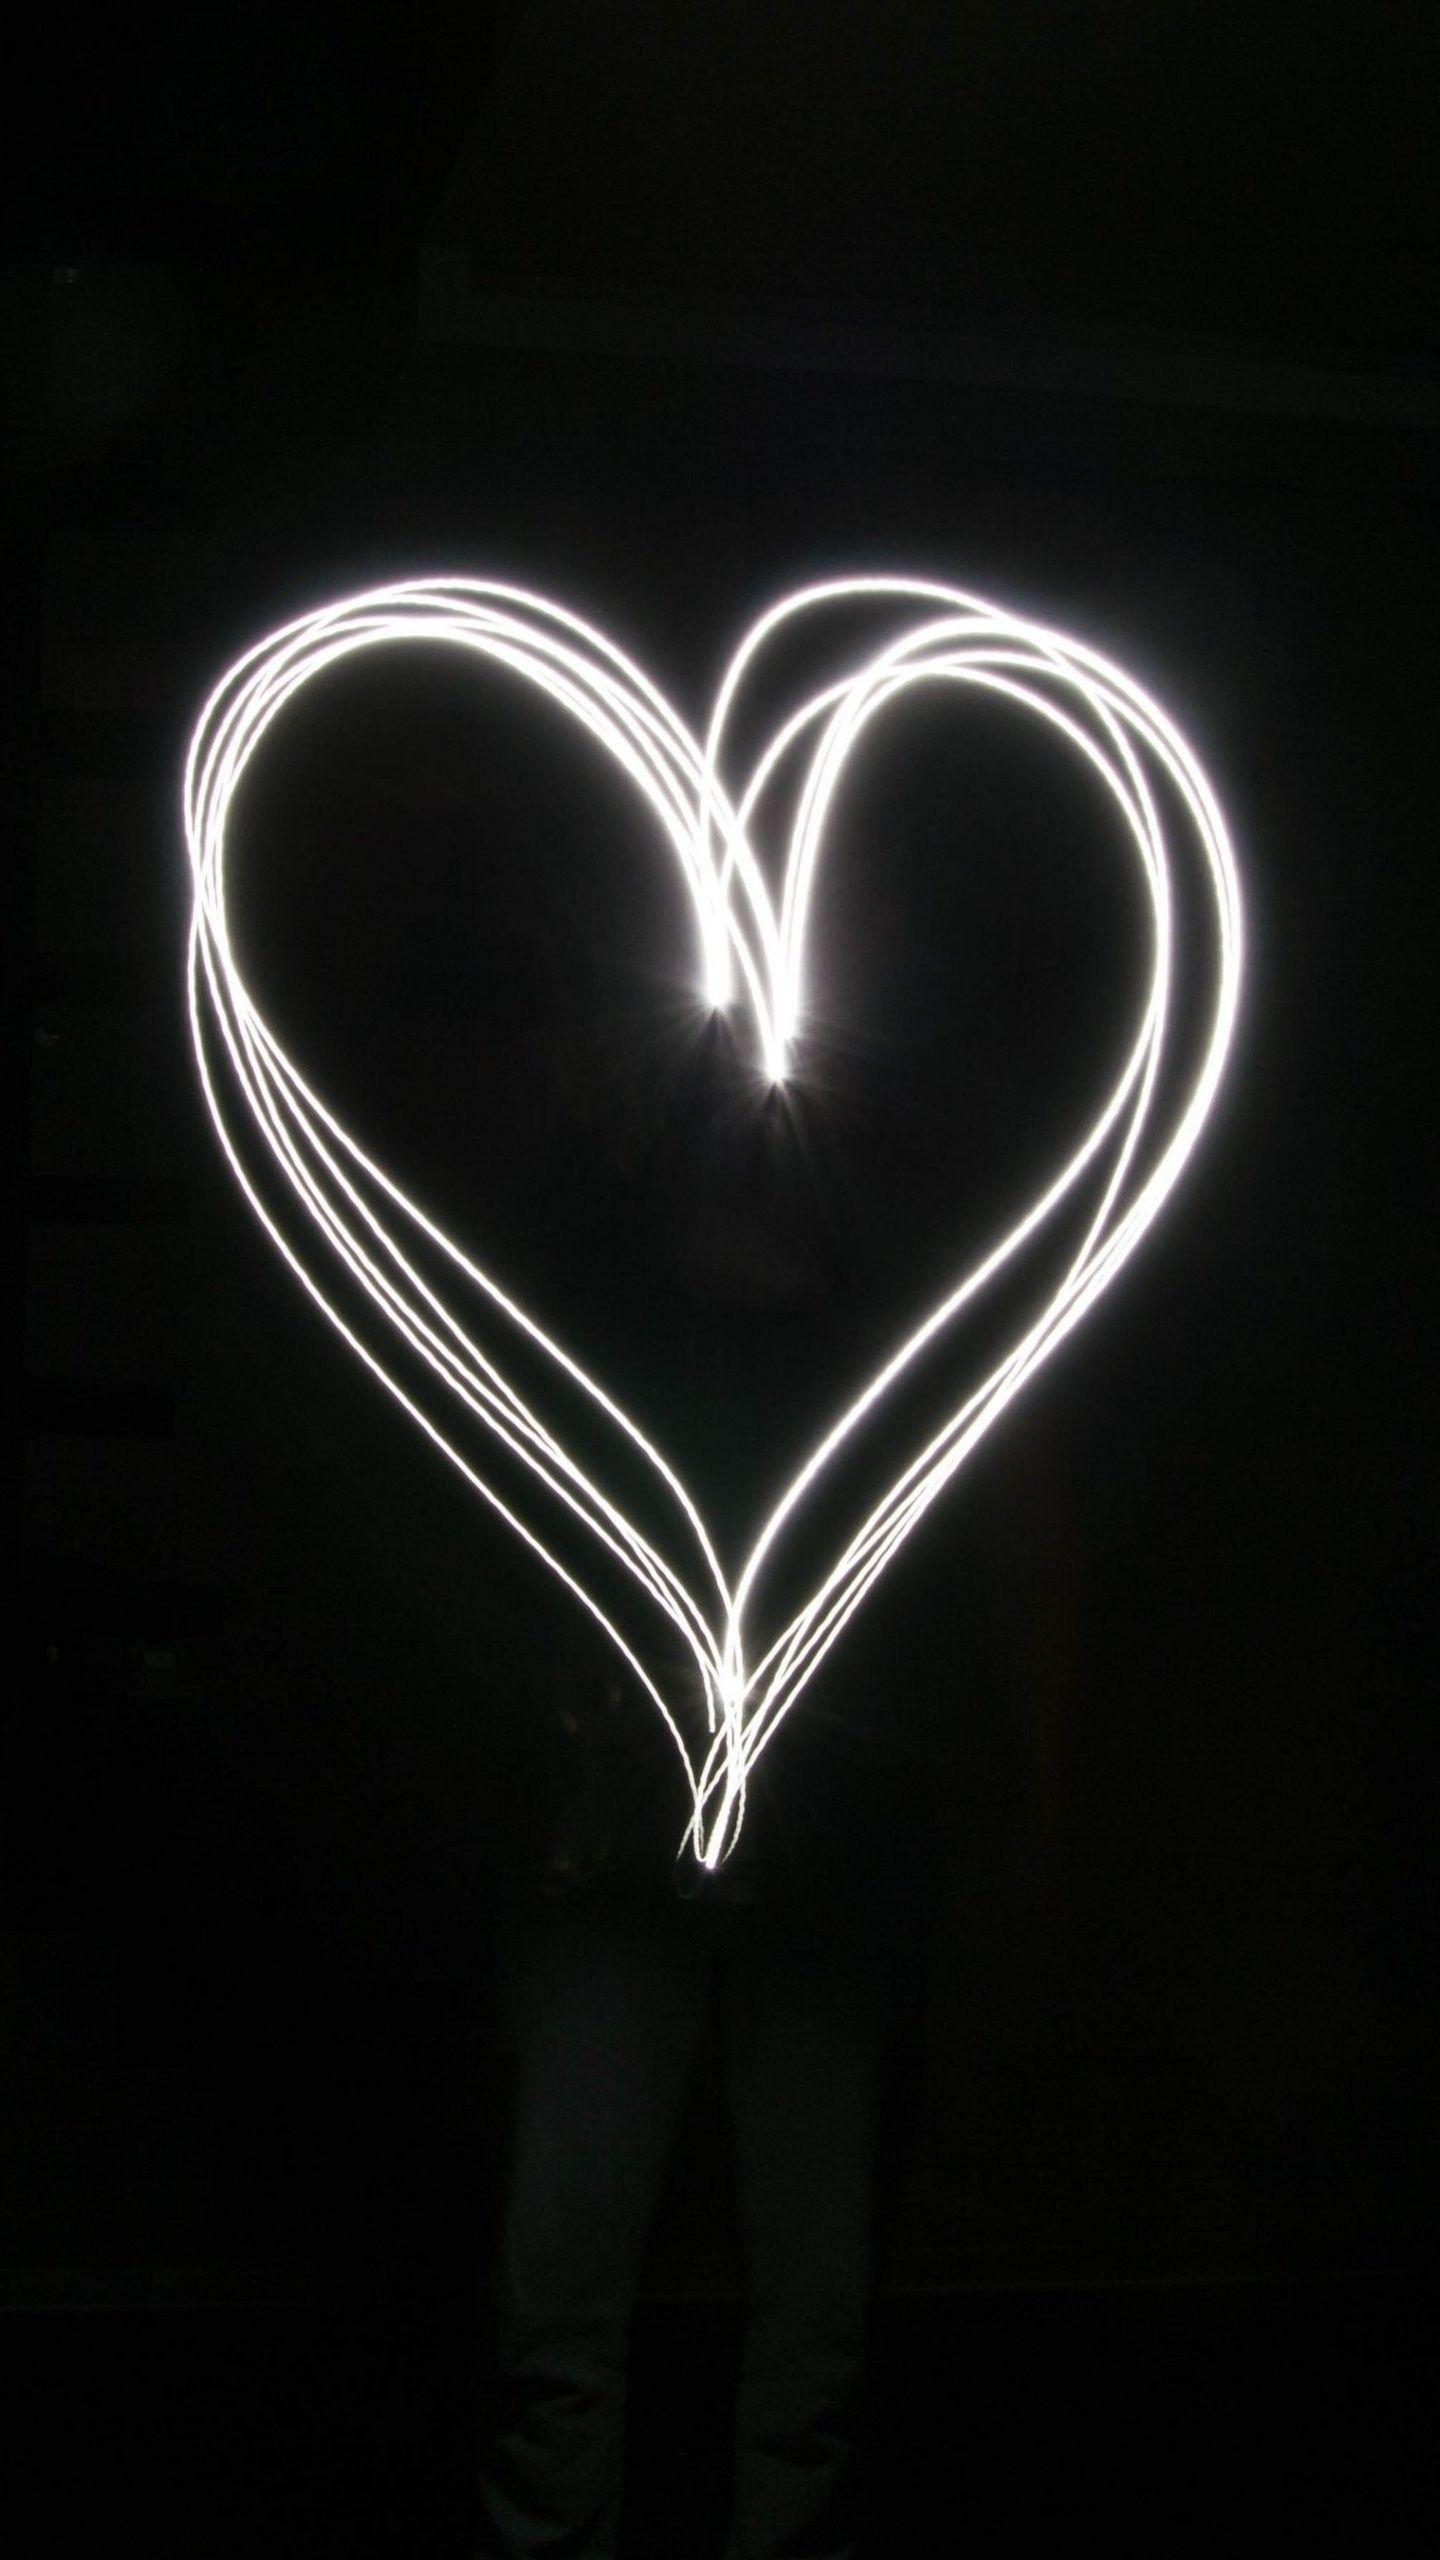 Cute Black Heart Wallpapers Top Free Cute Black Heart Backgrounds Wallpaperaccess